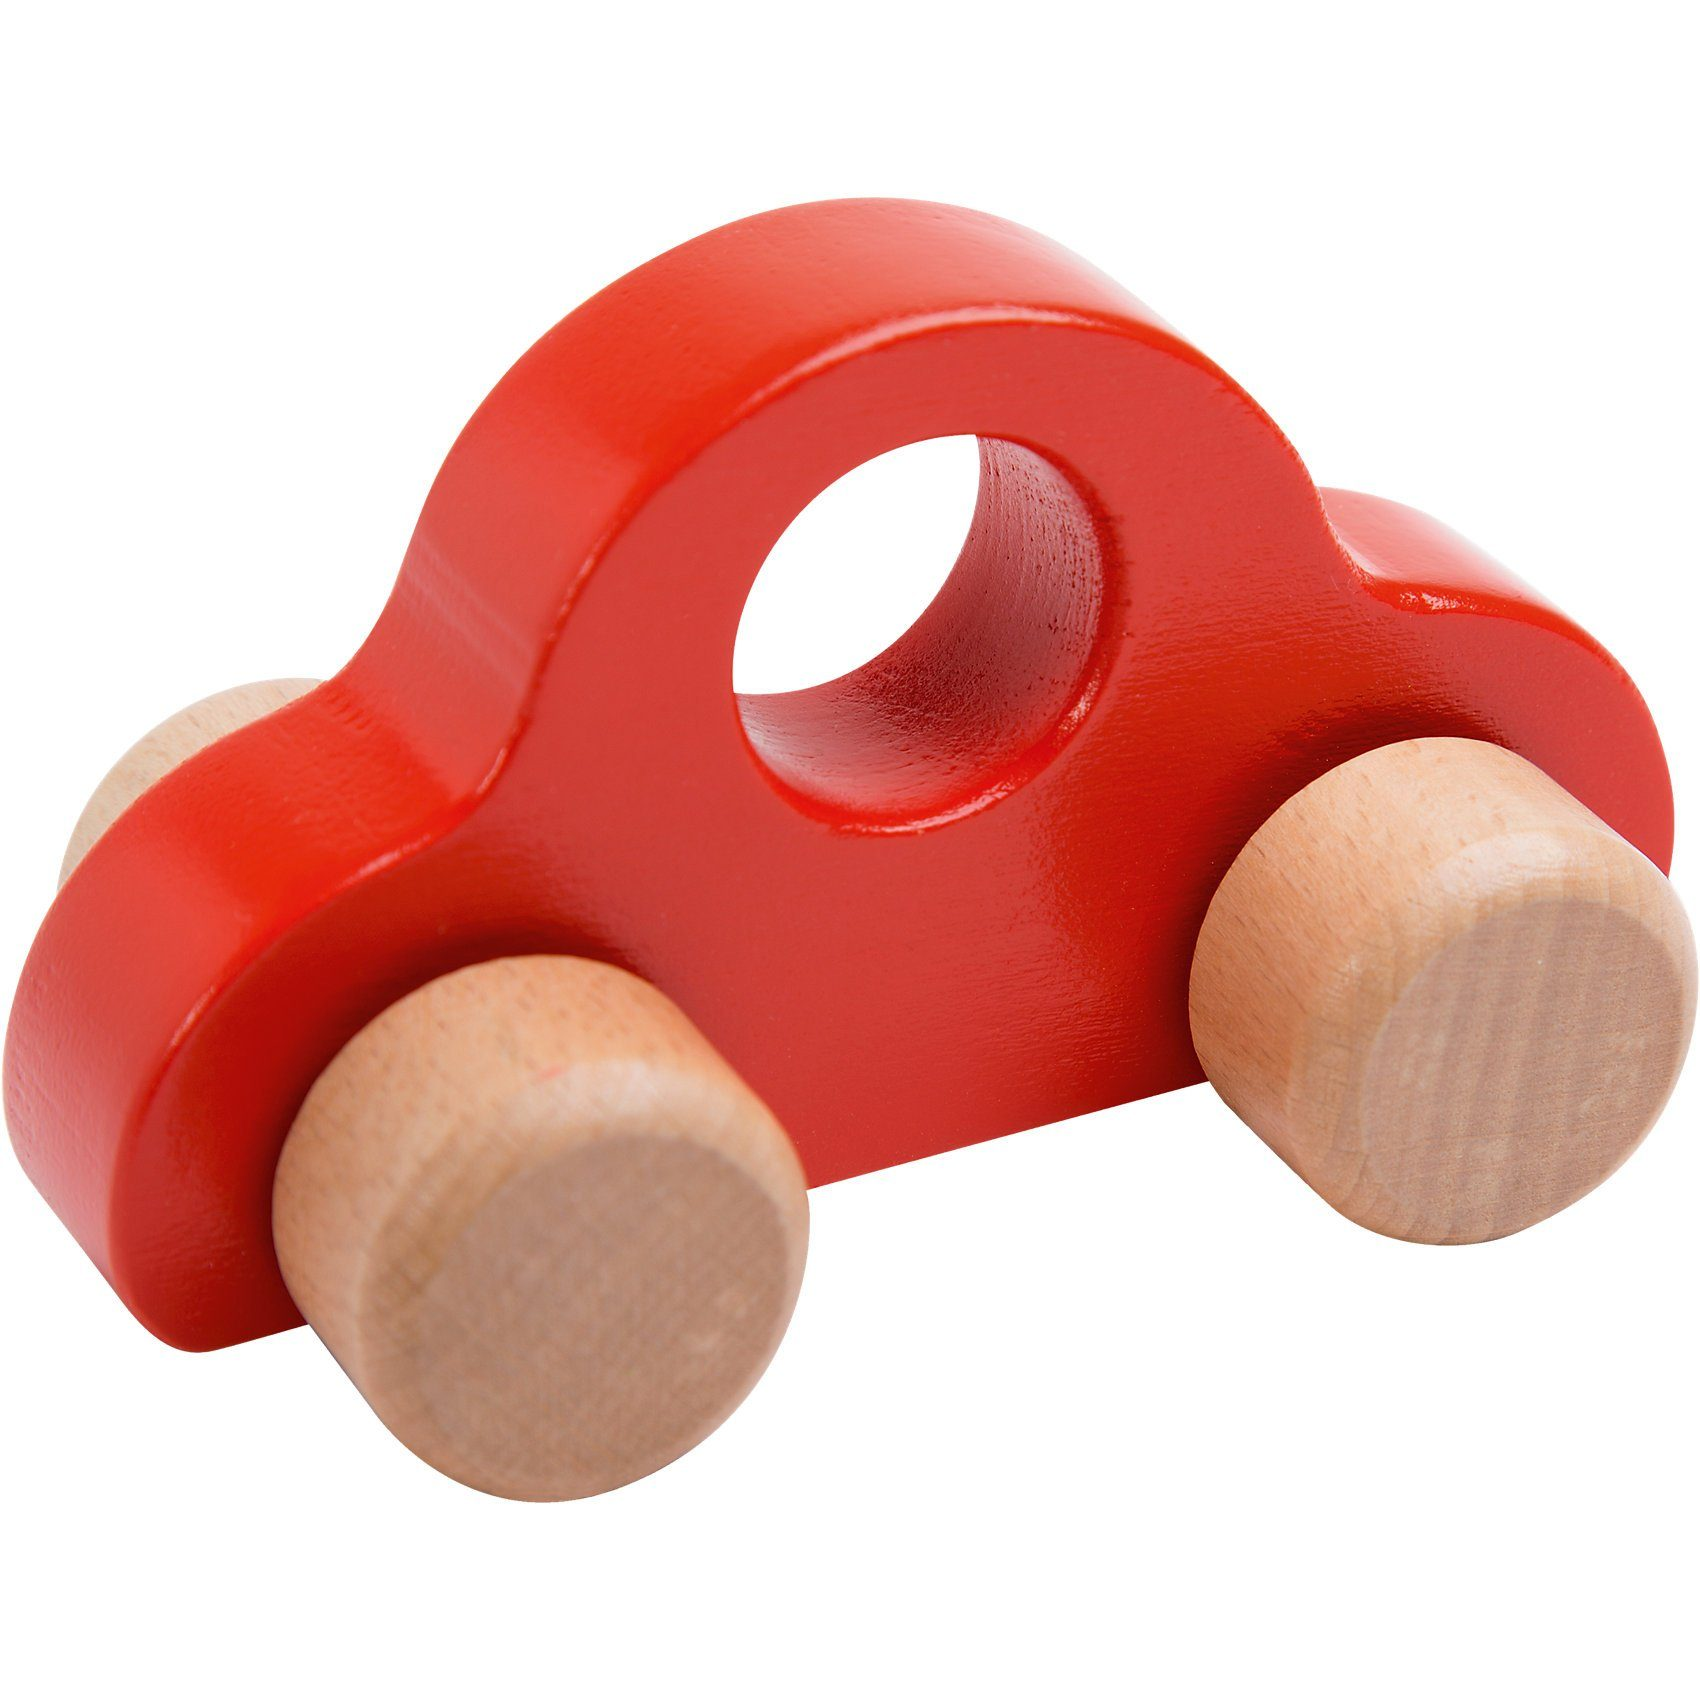 Rotho Babydesign Holz-Greifauto